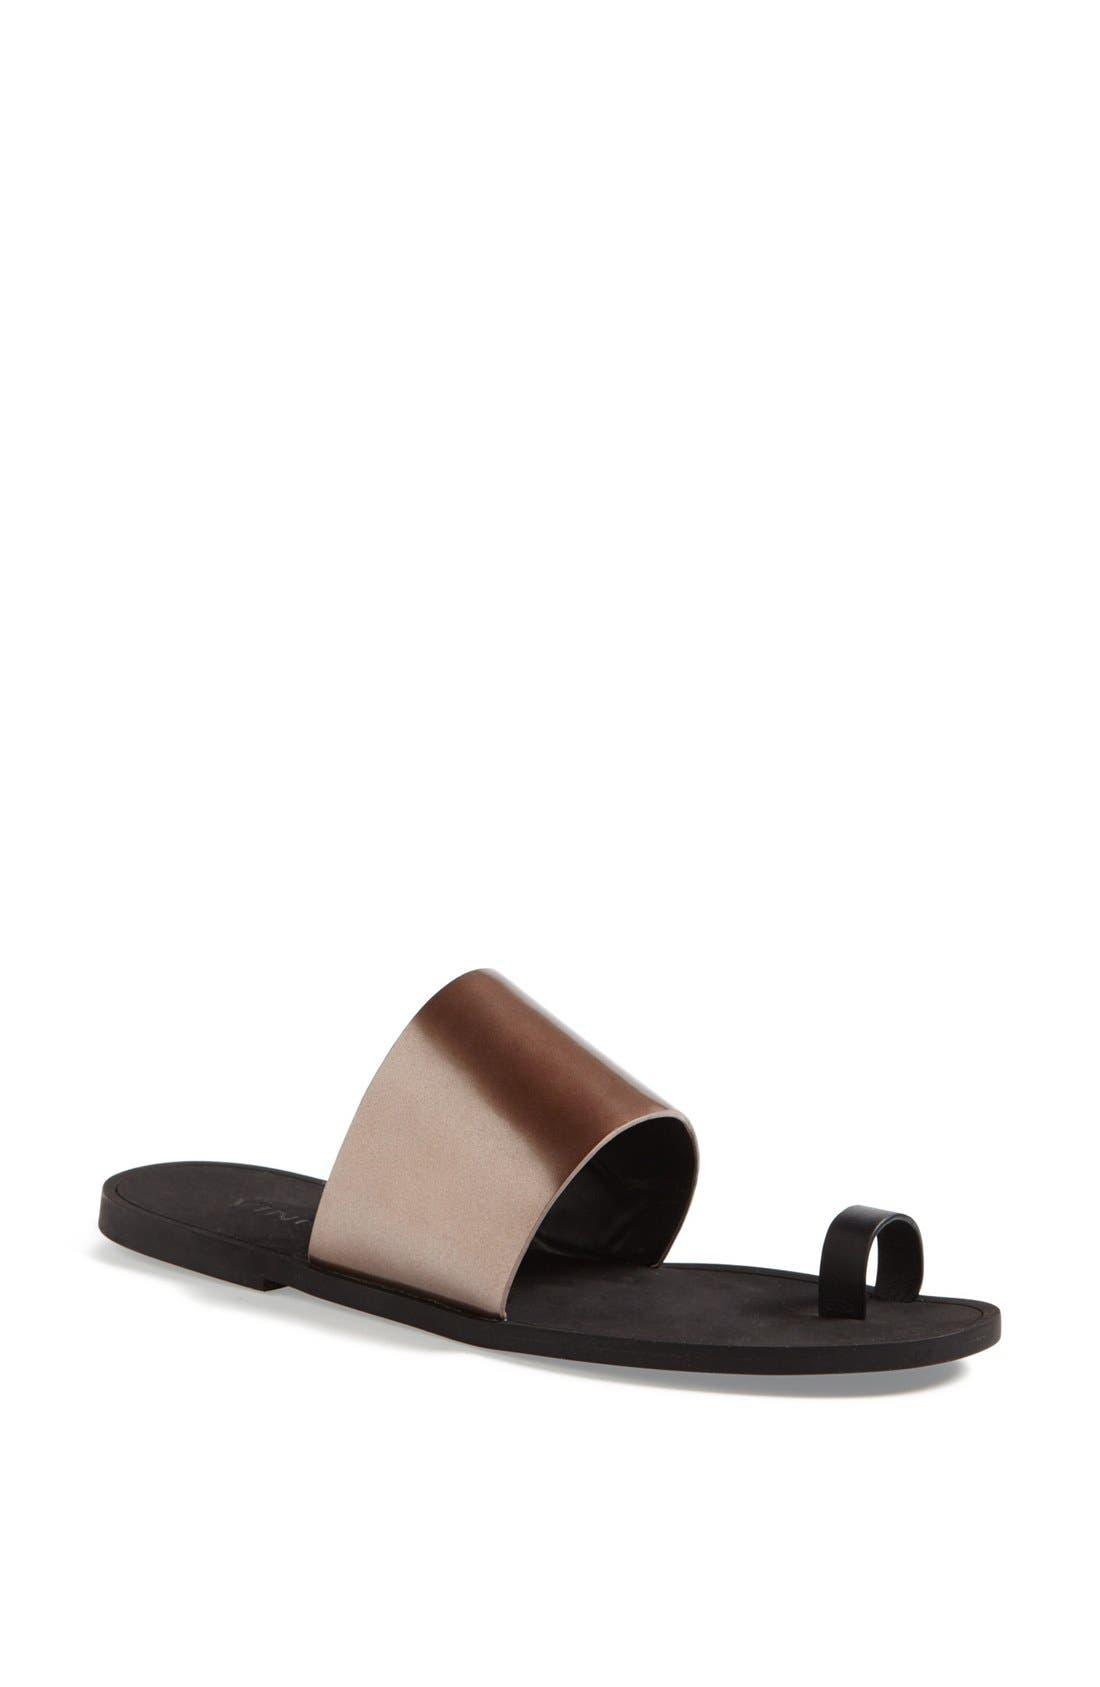 Alternate Image 1 Selected - Vince 'Sandrine' Sandal (Online Only)